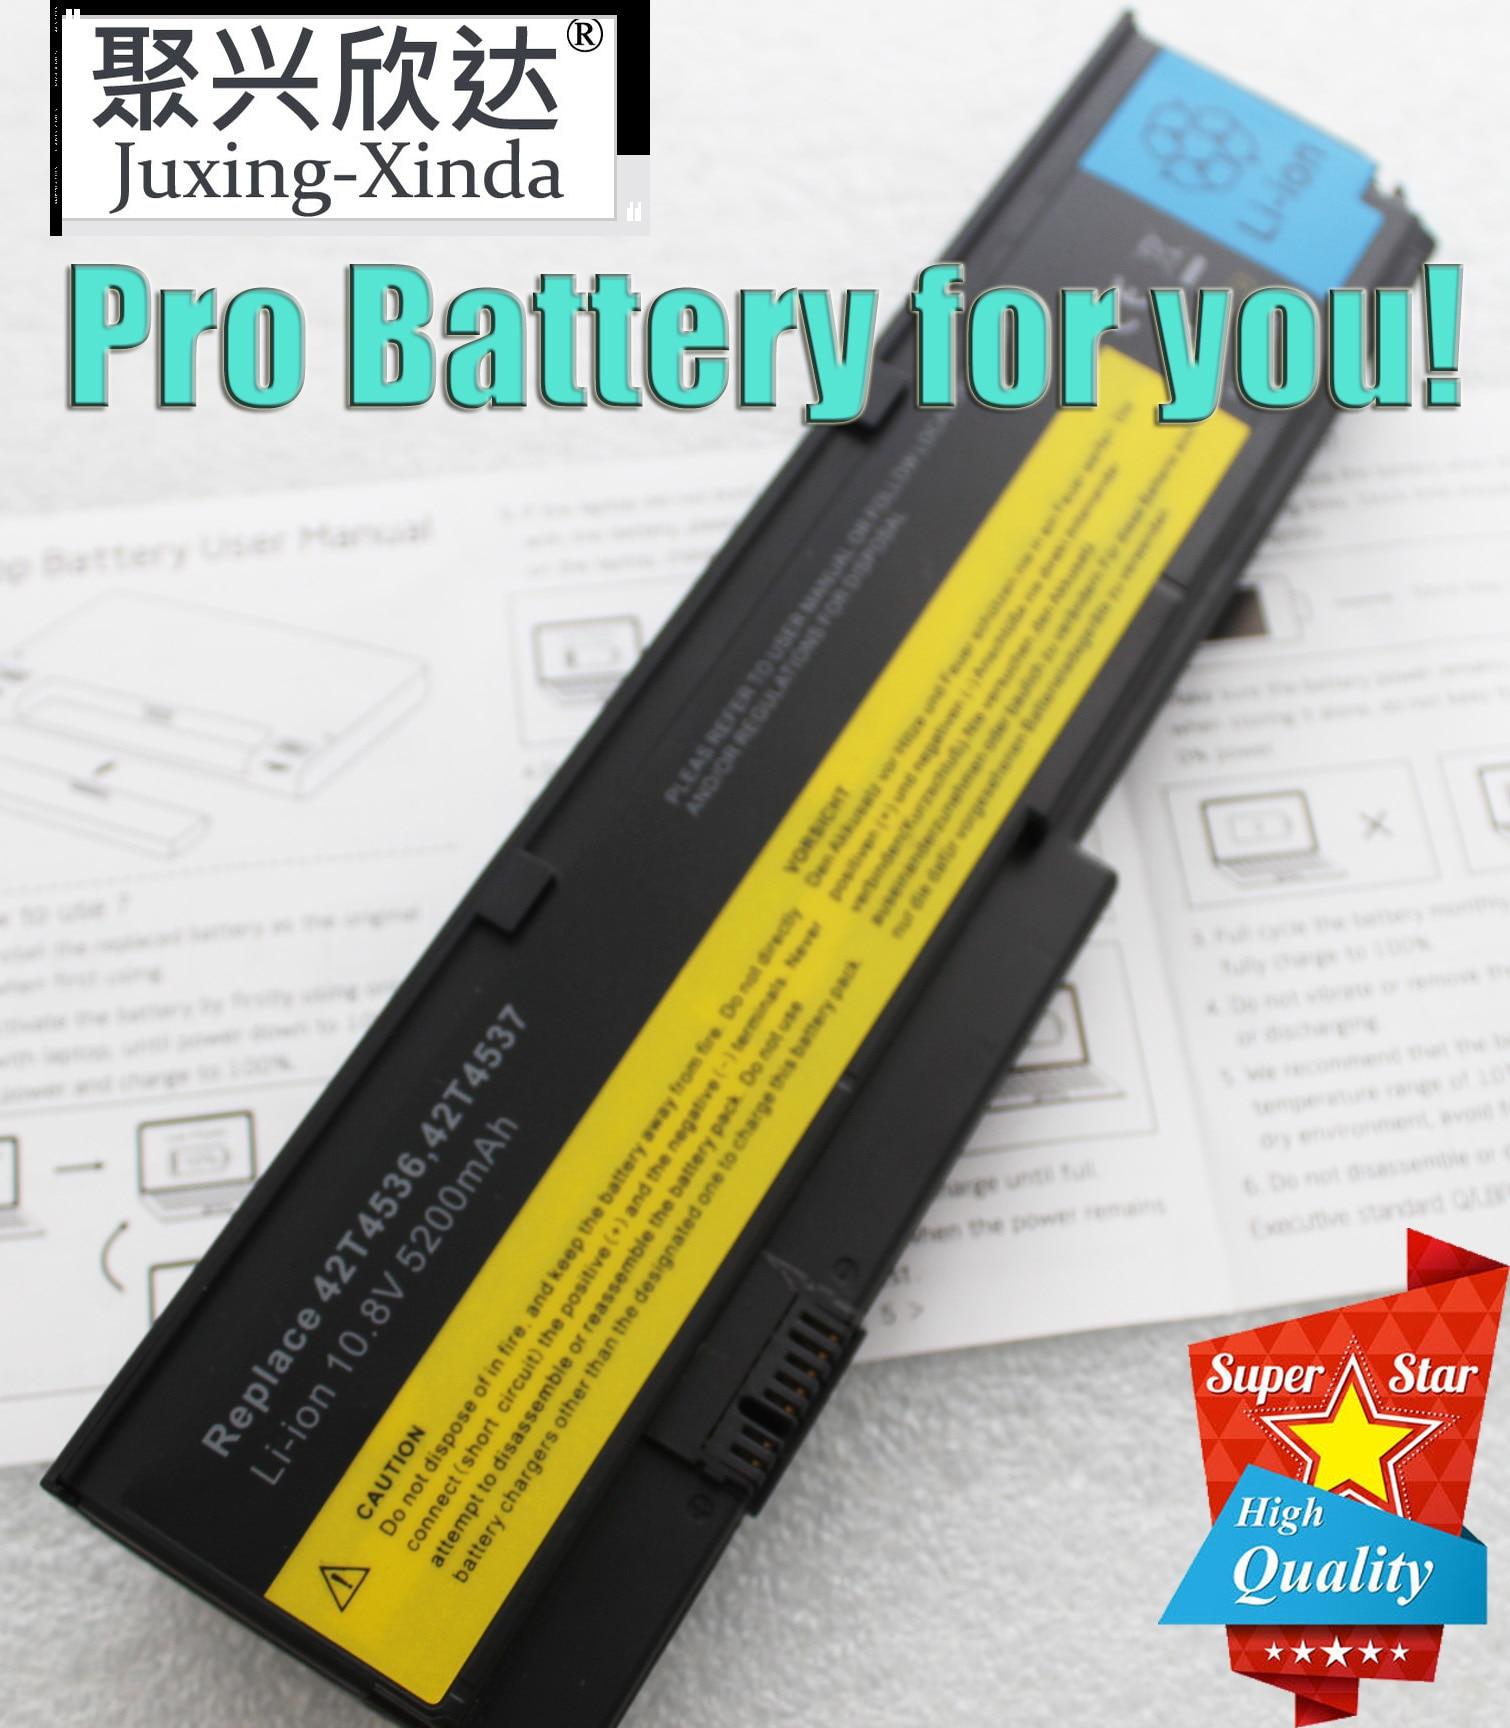 Laptop Battery For Lenovo ThinkPad X200 X200s X201 X201i X201s 42T4834 42T4835 43R9254 ASM 42T4537 FRU 42T4536 FRU 42T4538